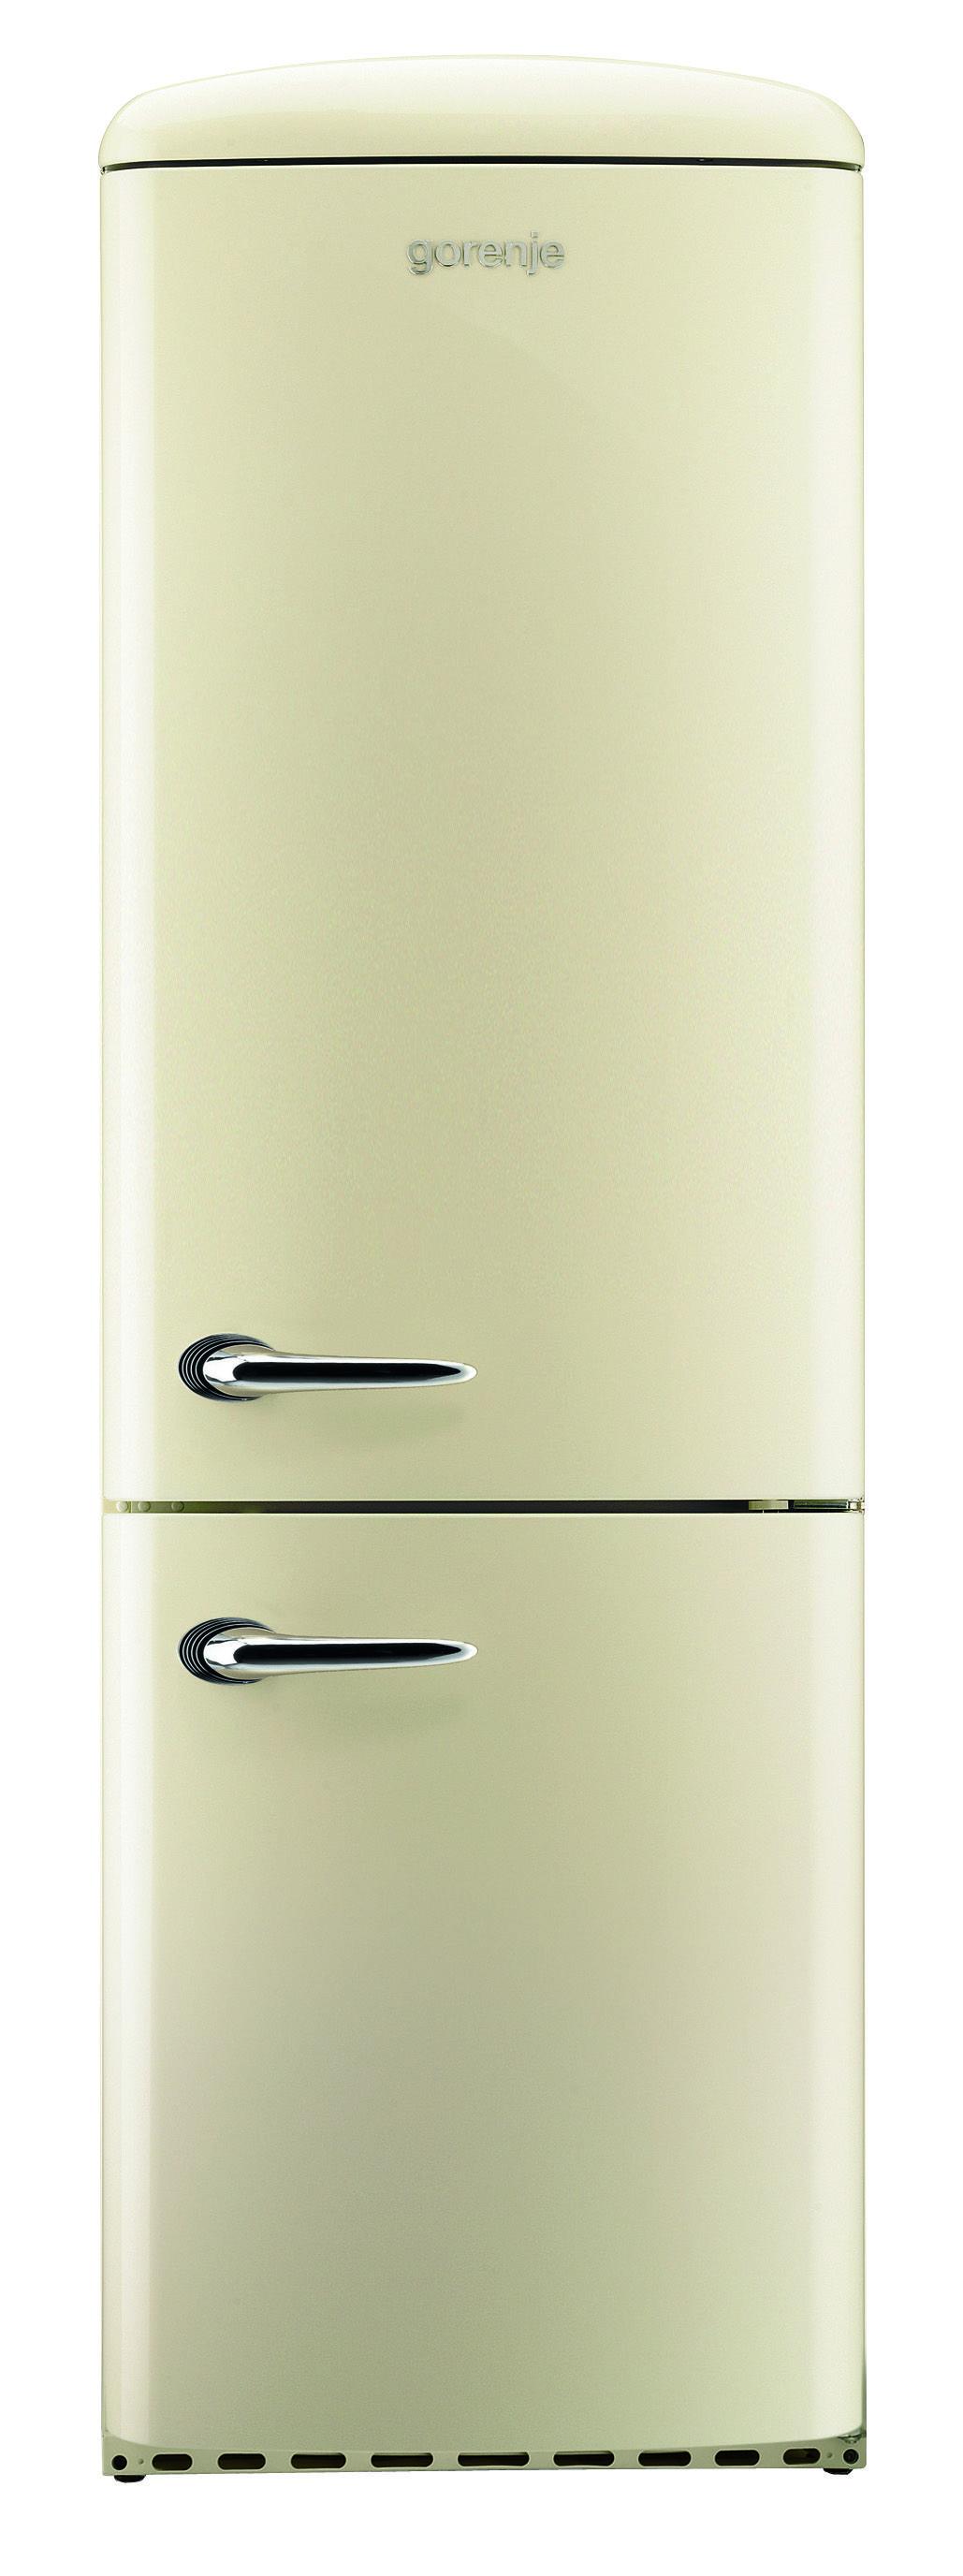 Gorenje Retro Freestanding Fridge Freezer Freestanding Fridge Retro Fridge Dining Room Updates